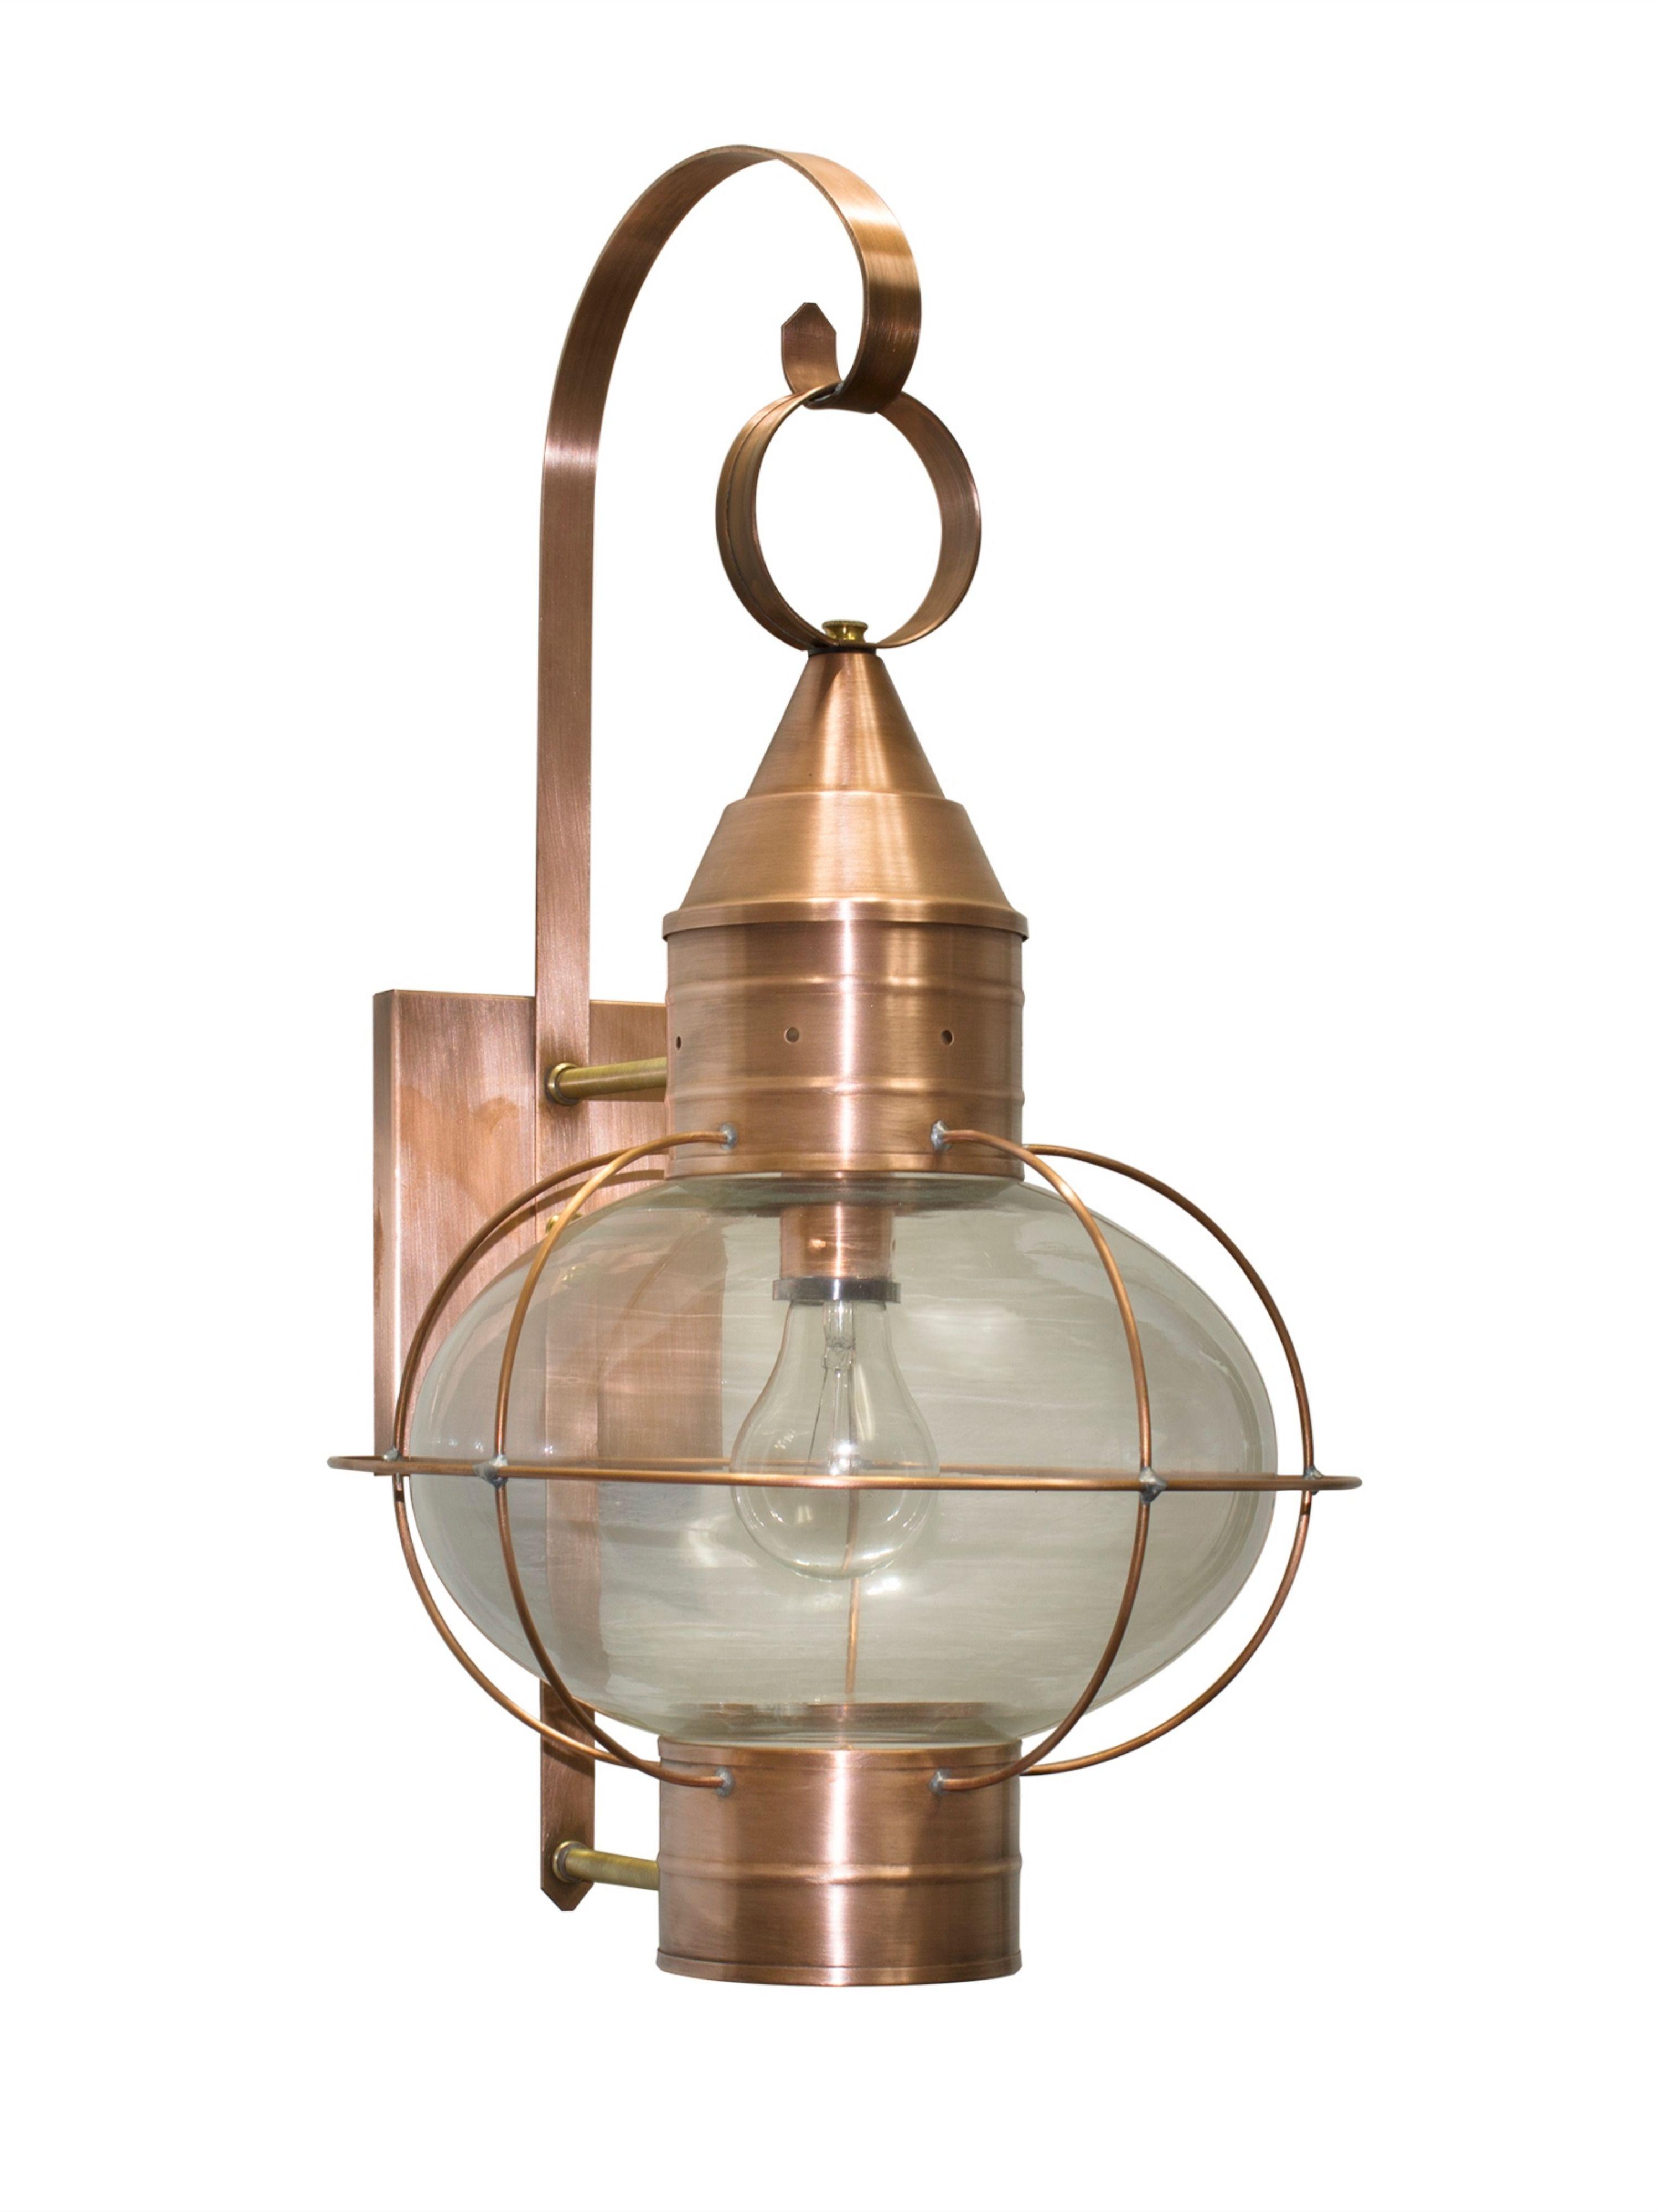 Pin By Carepalm On Farmhouse Pretty Copper Lighting Outdoor Wall Lantern Wall Lantern